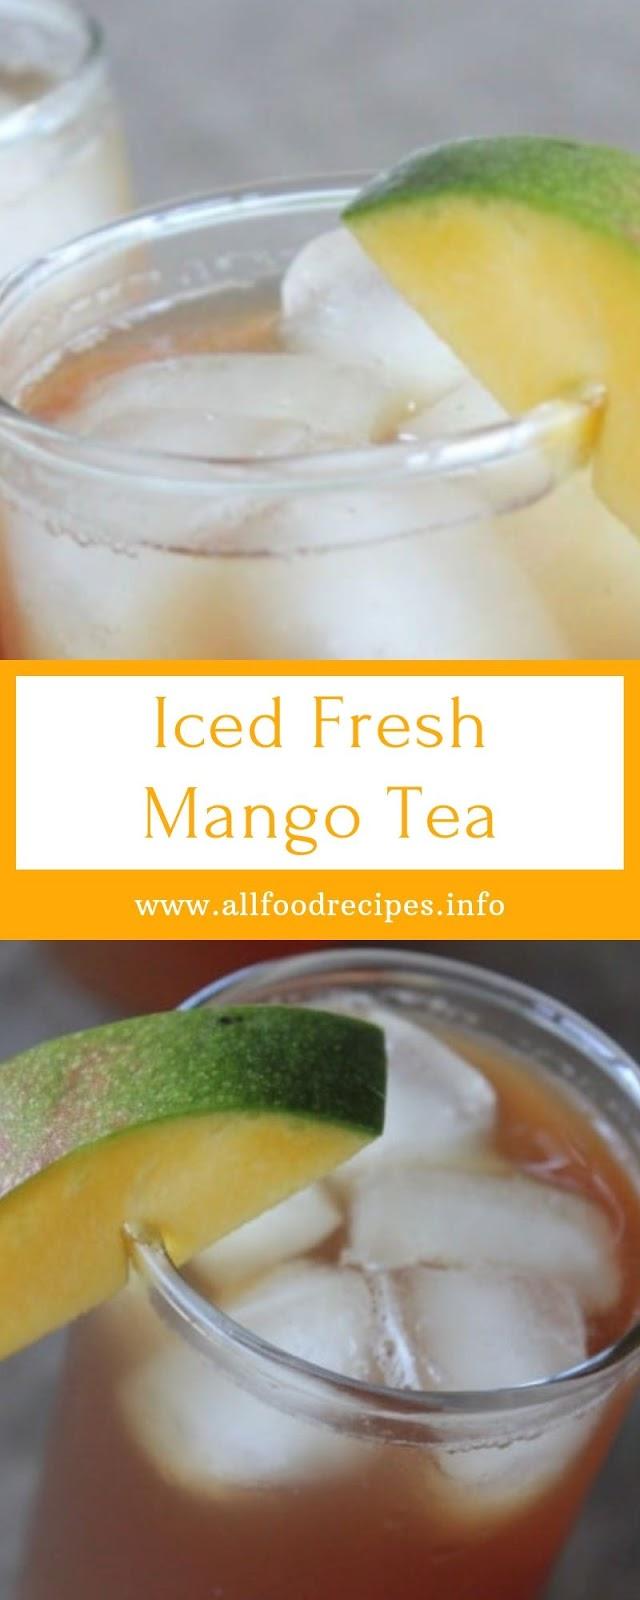 Iced Fresh Mango Tea